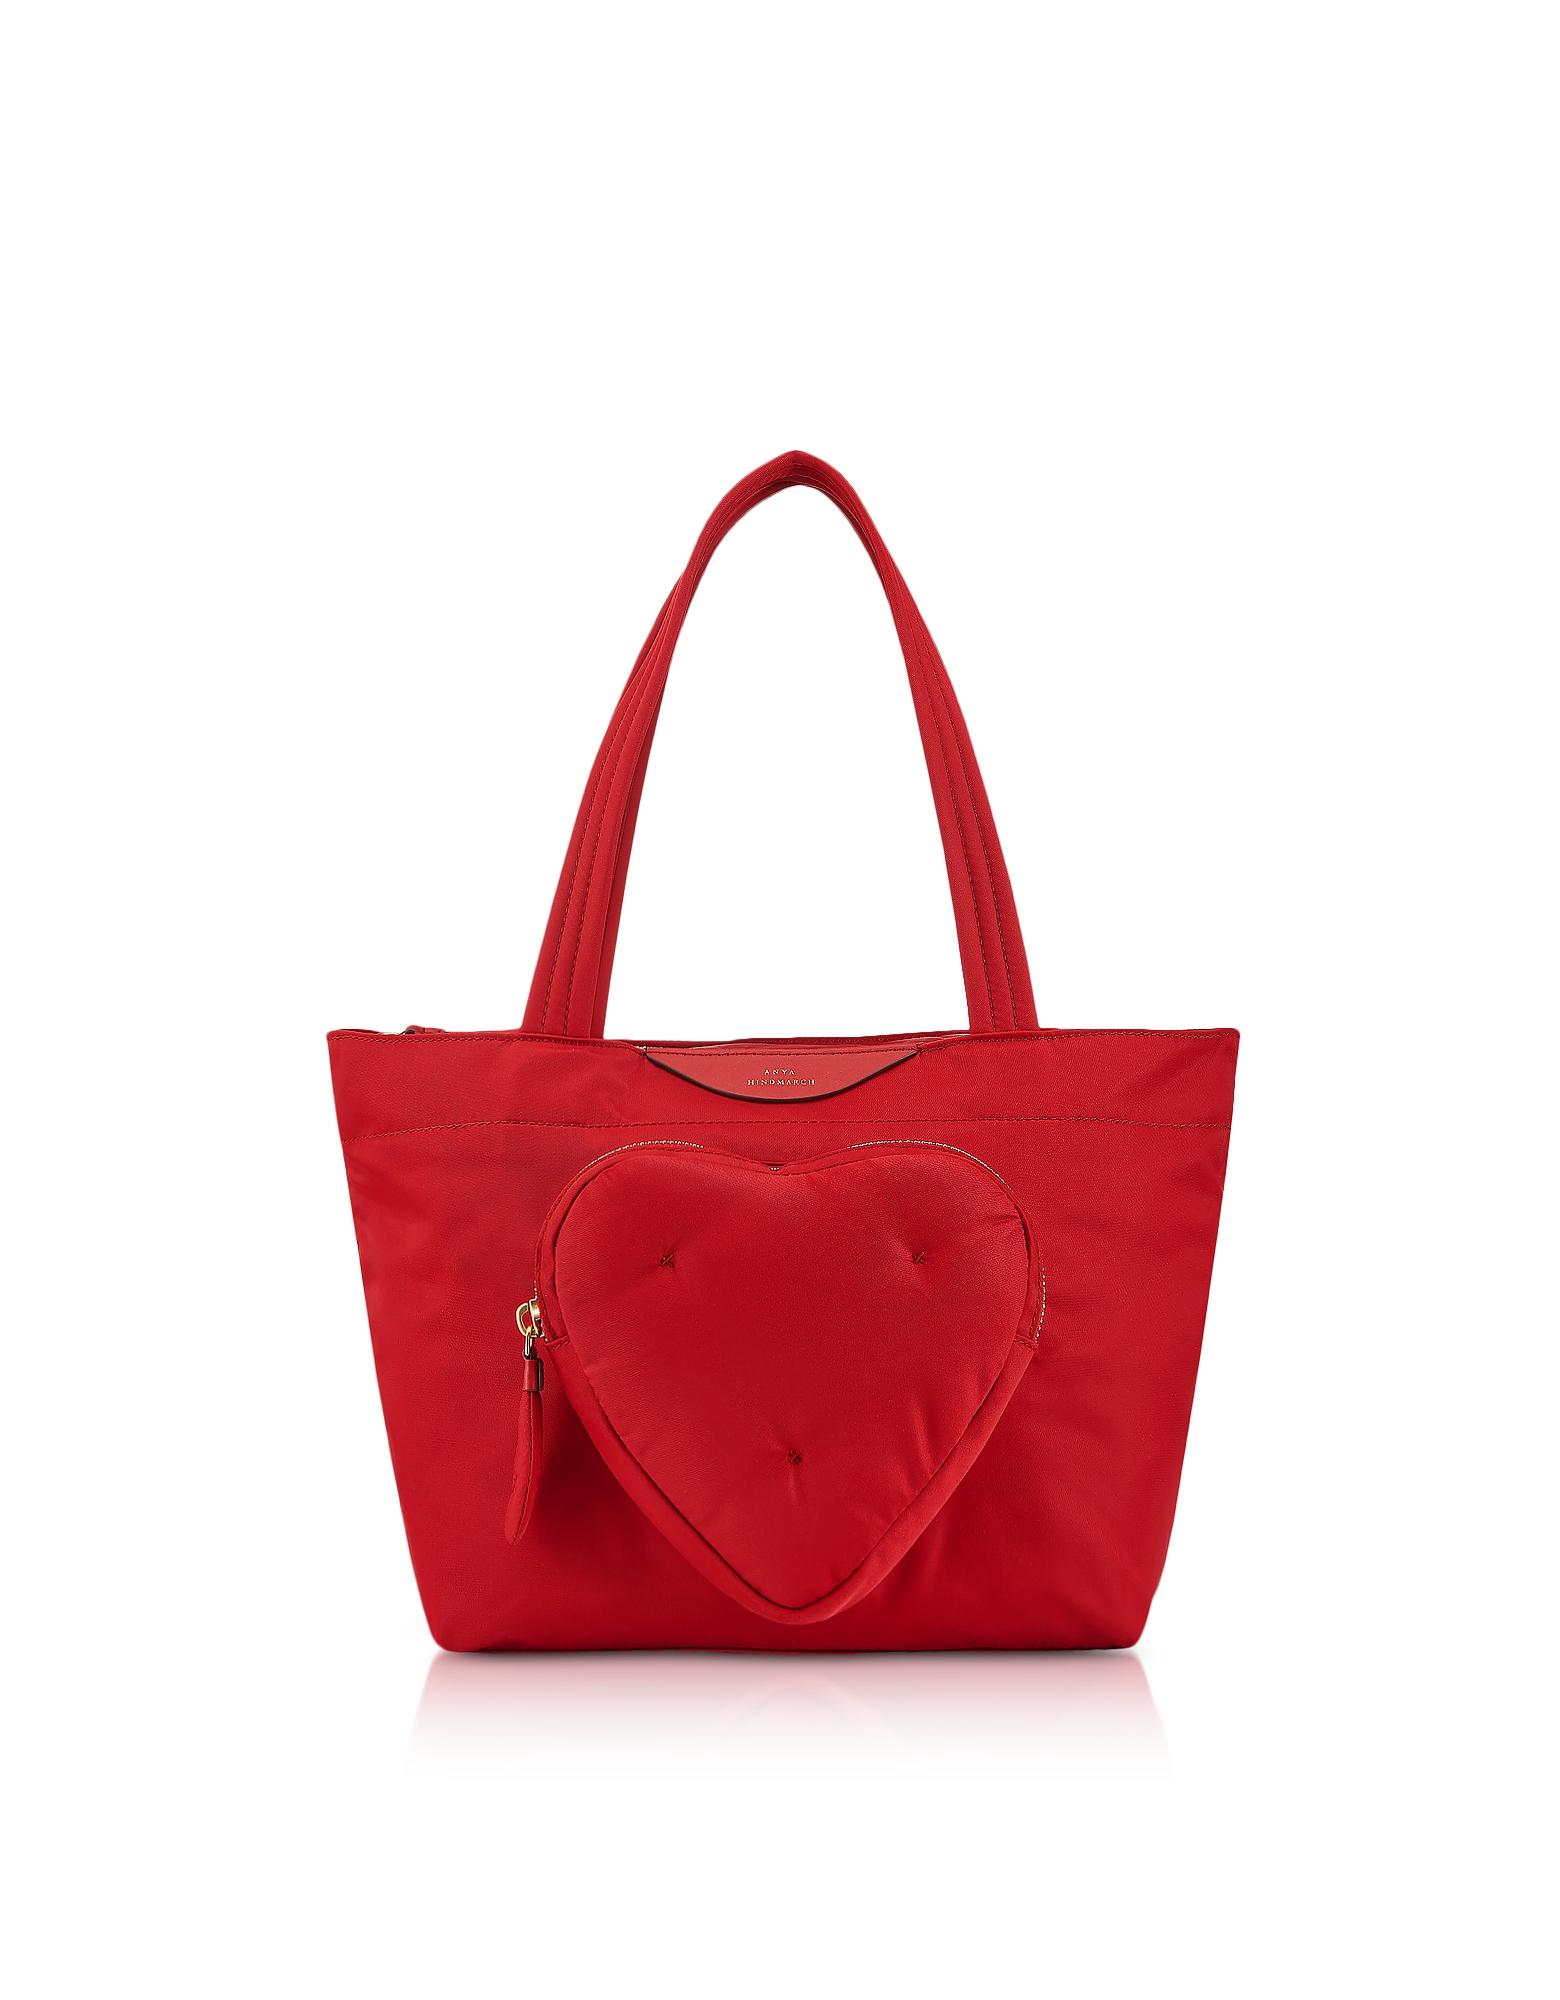 Image of Anya Hindmarch Designer Handbags, Red Nylon Mini Chubby Heart E/W Tote Bag